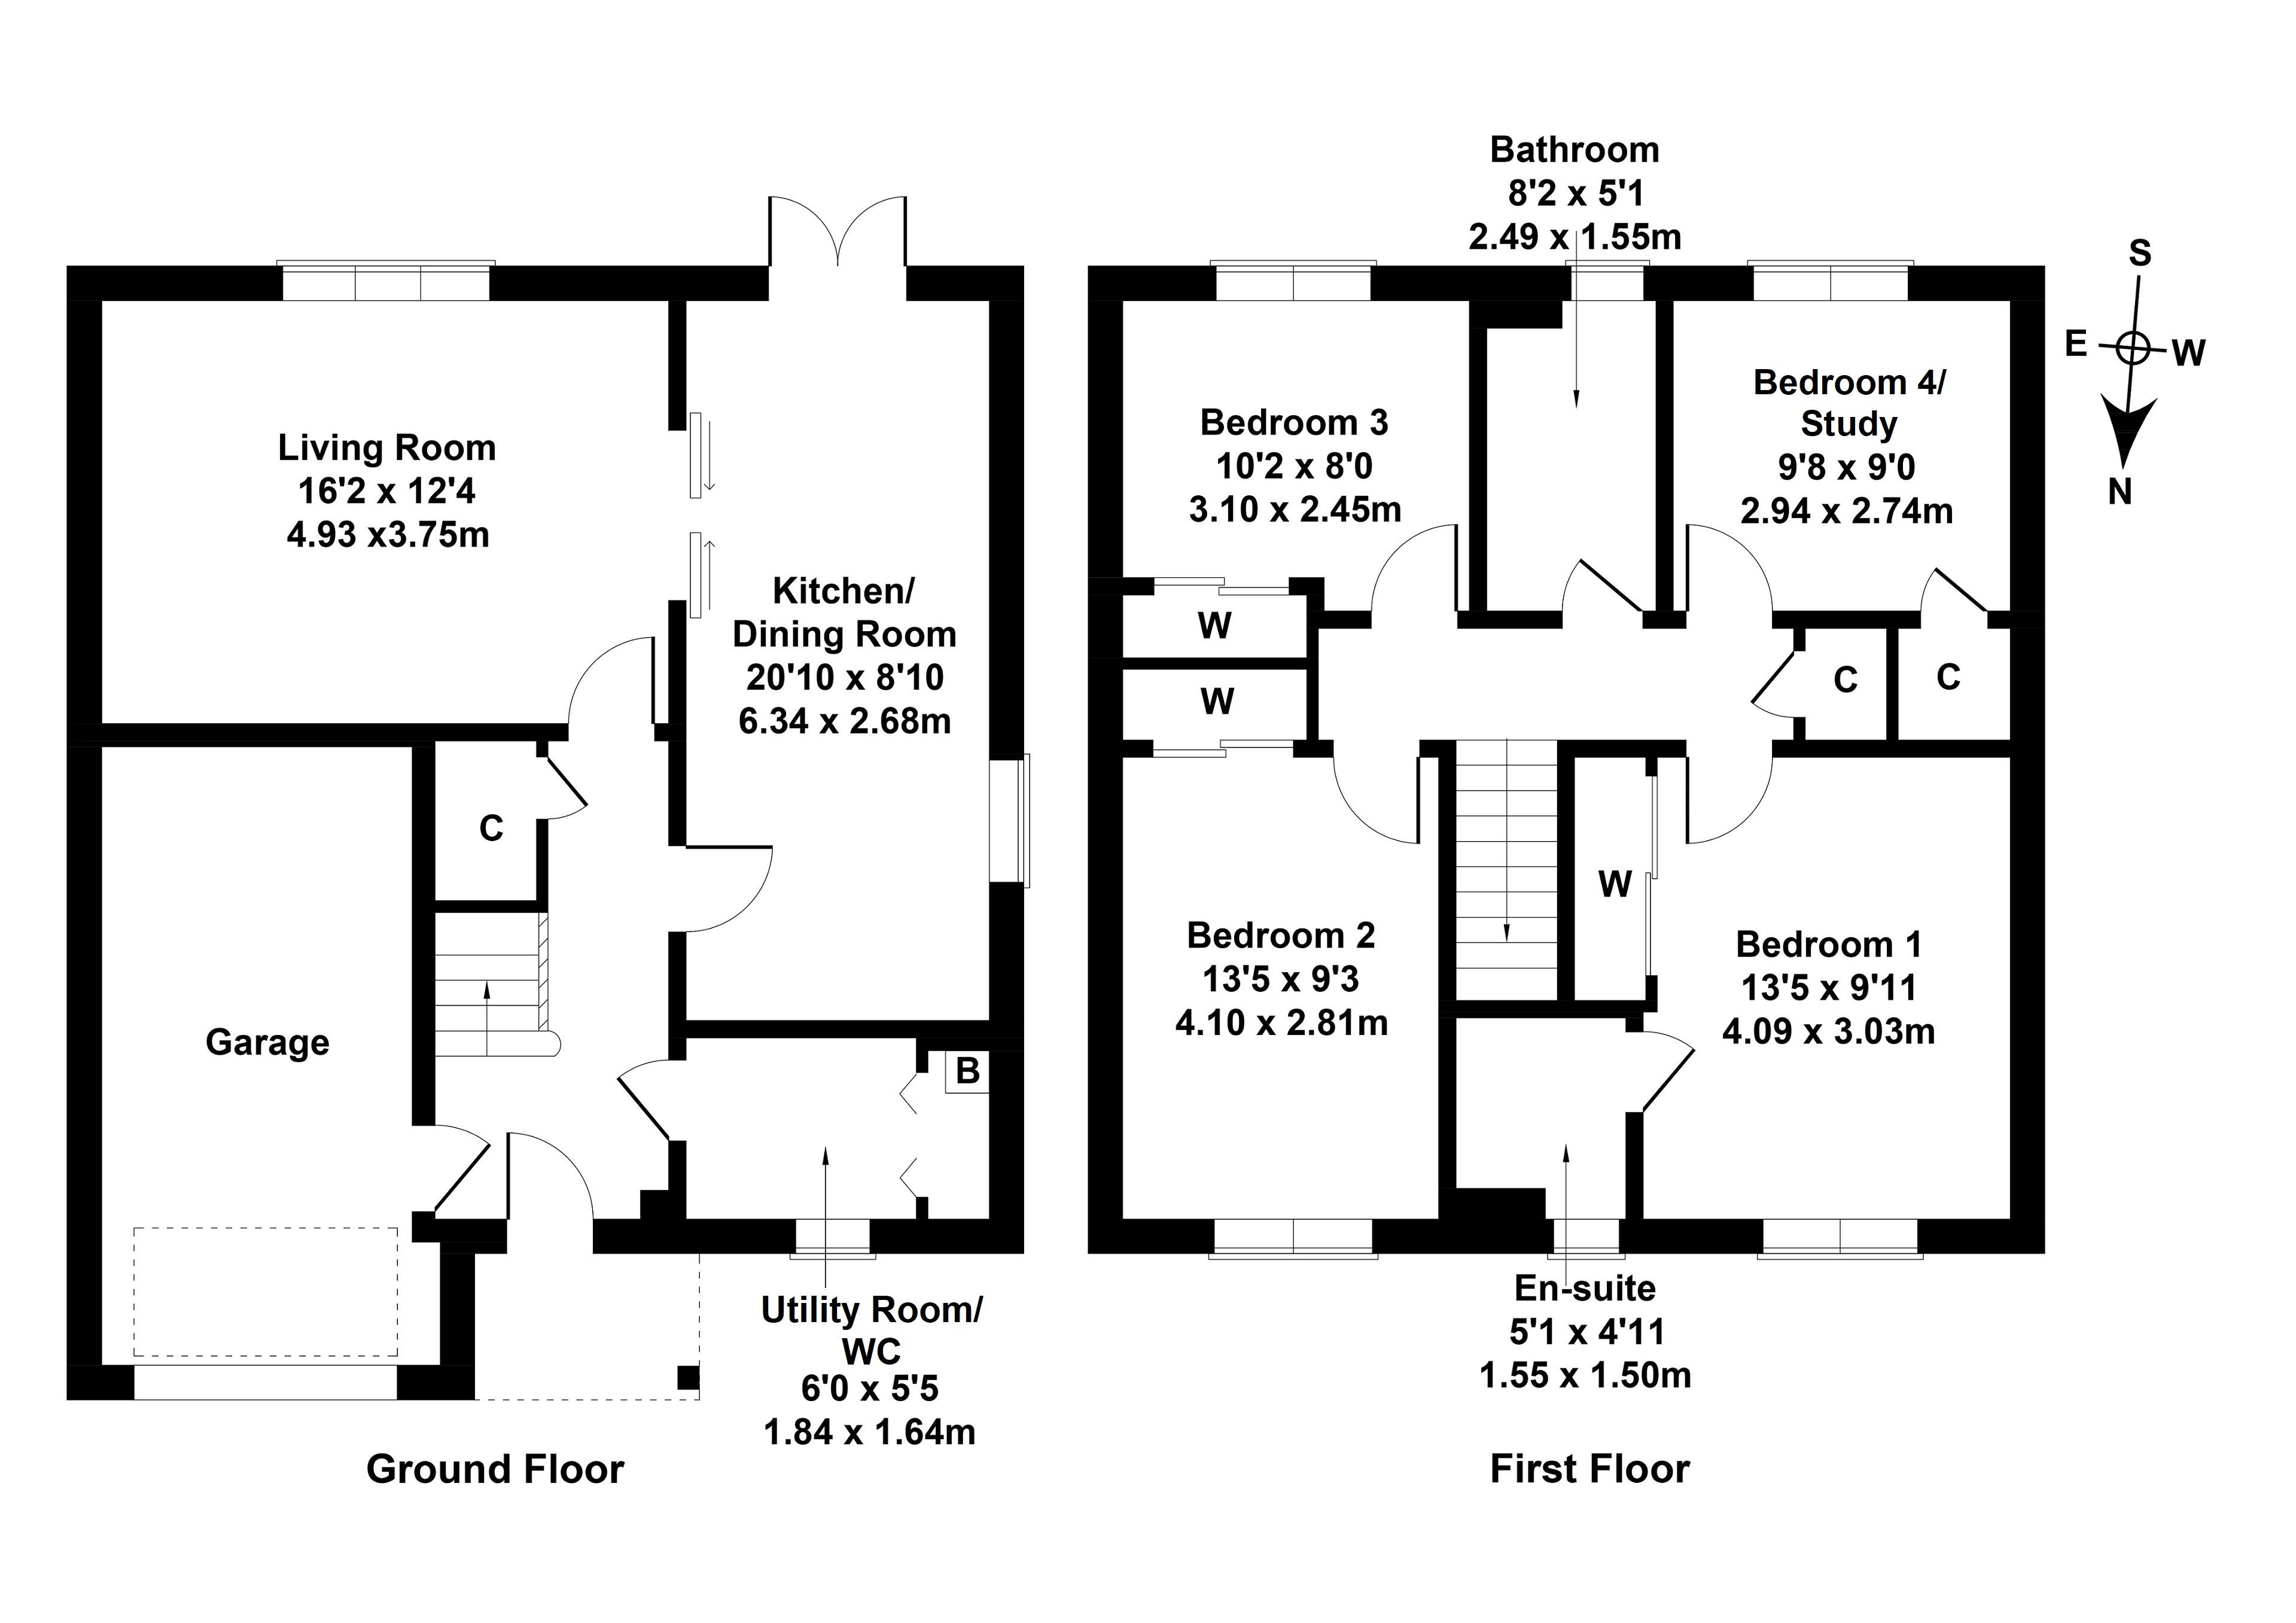 Floorplan 1 of 12 Thorny Crook Crescent, Dalkeith, Midlothian, EH22 2RJ